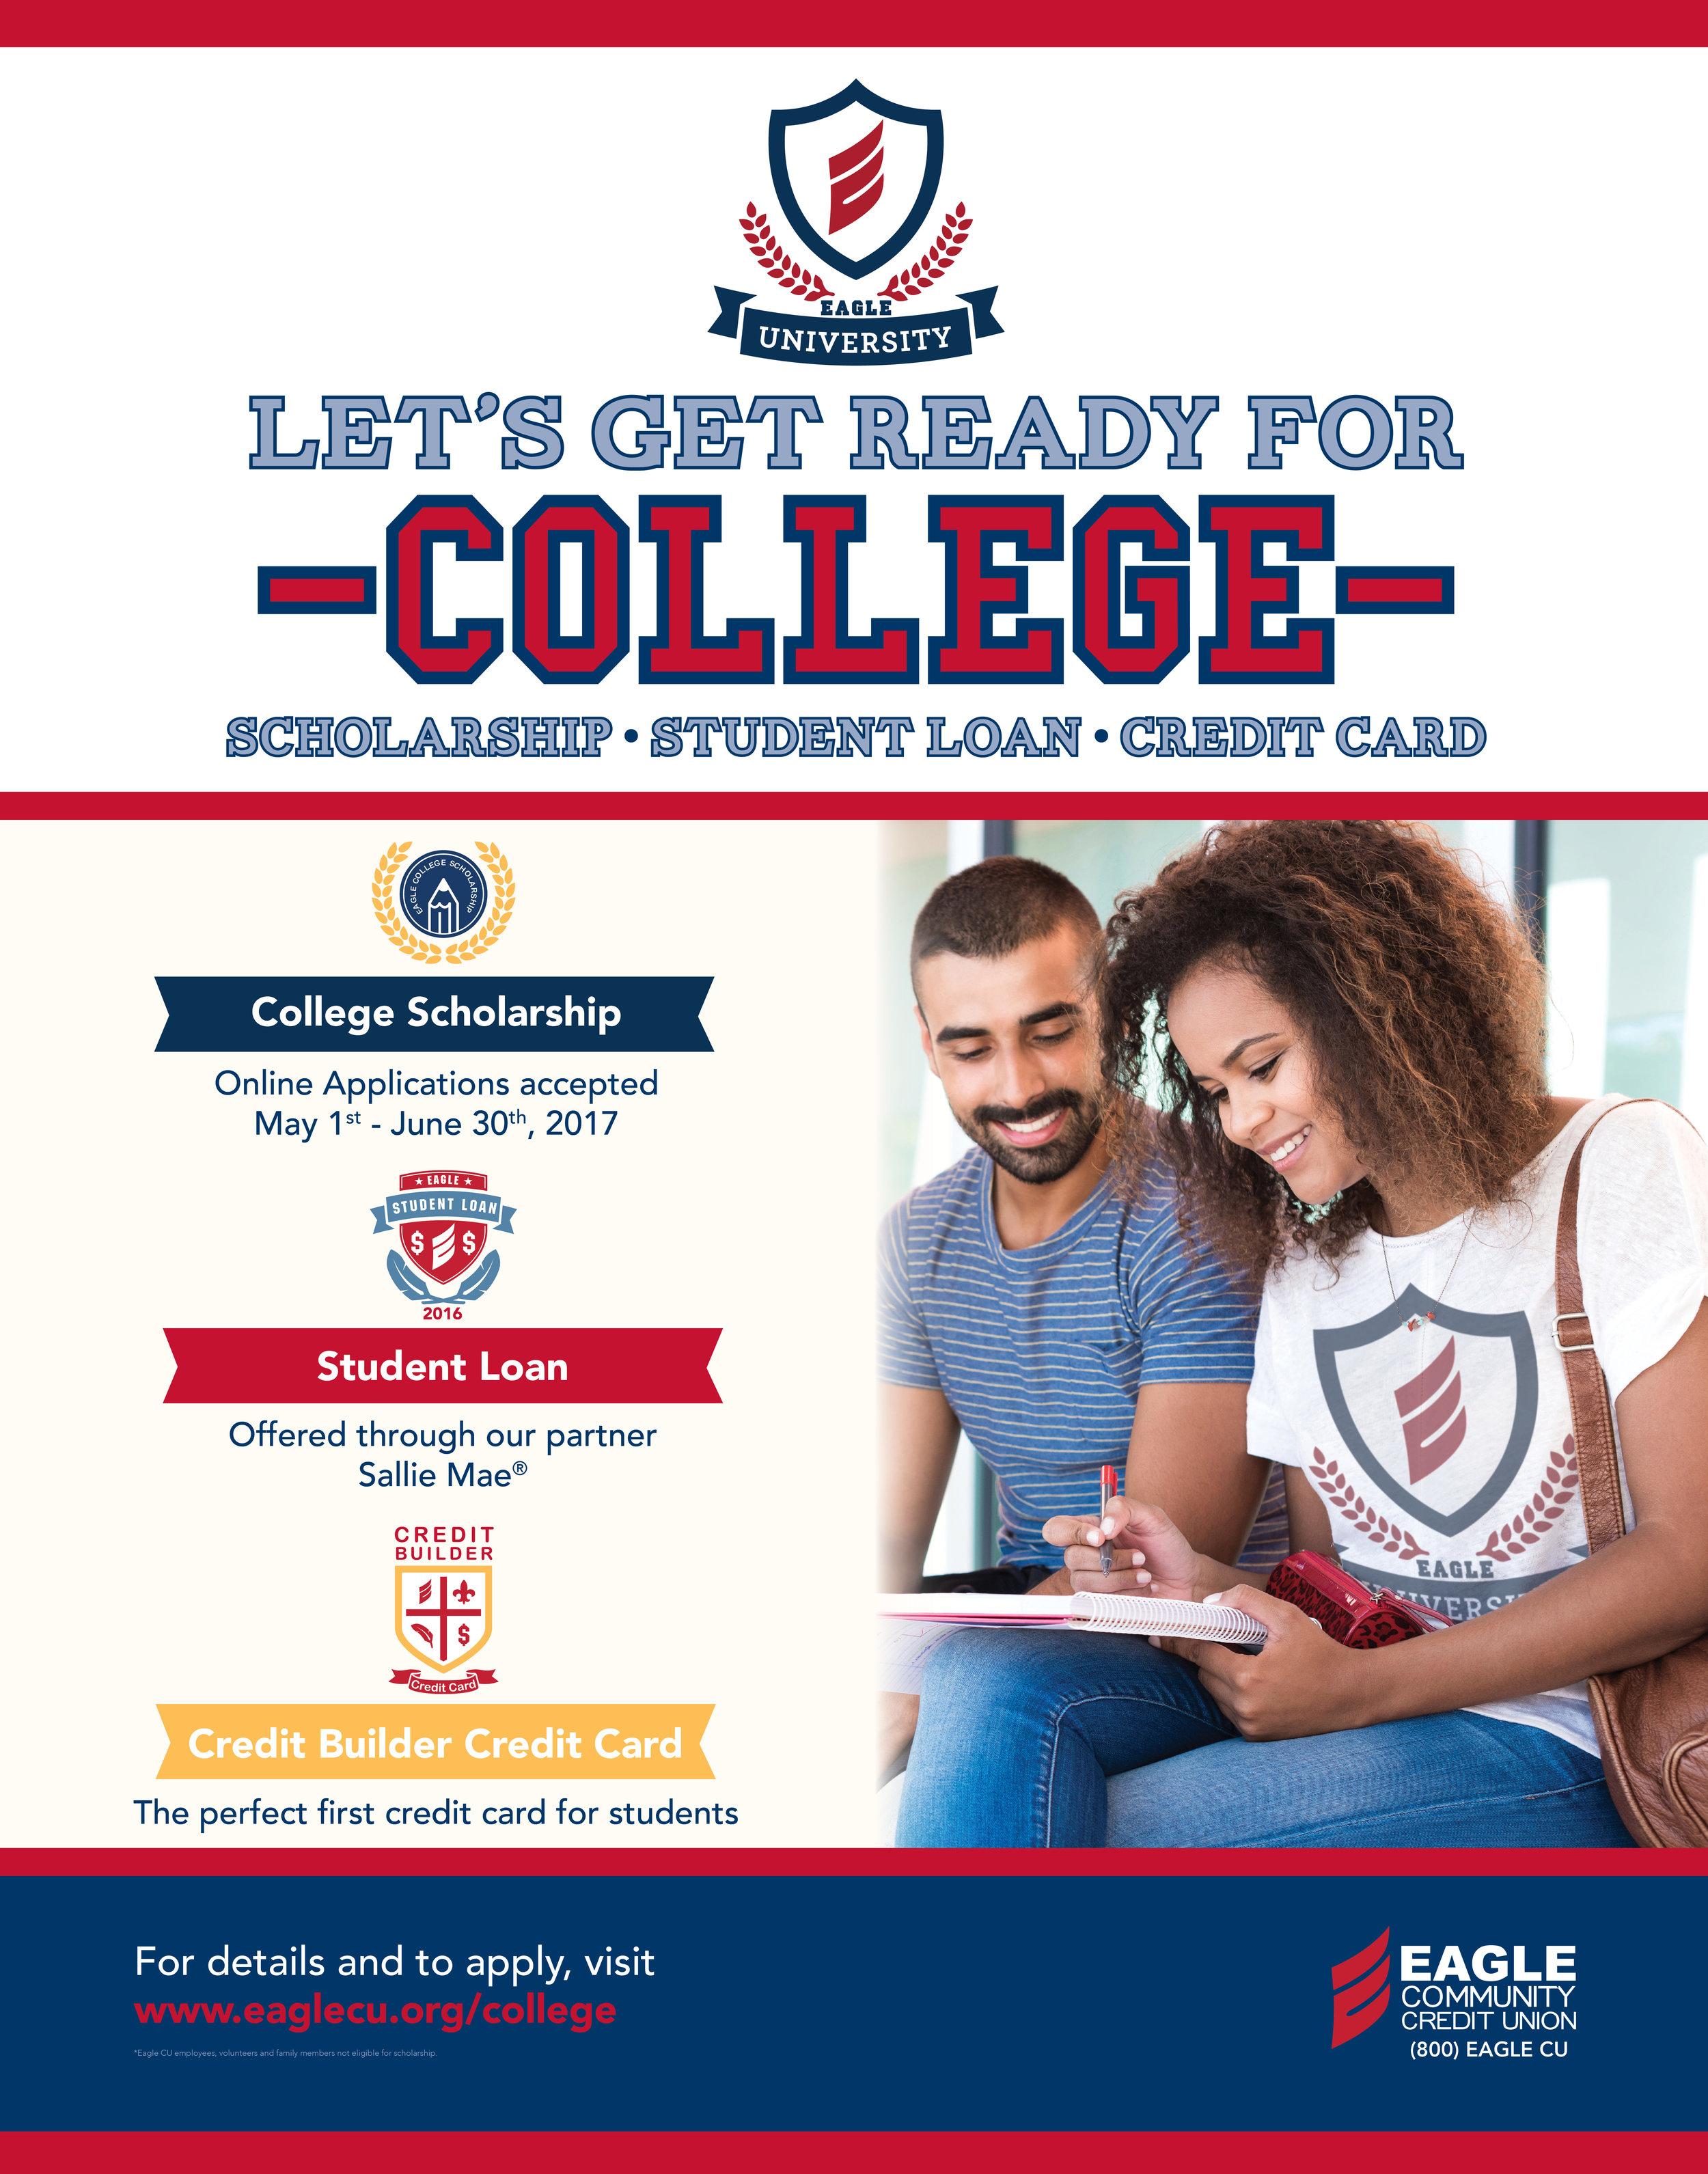 College 2017 22 x 28.jpg